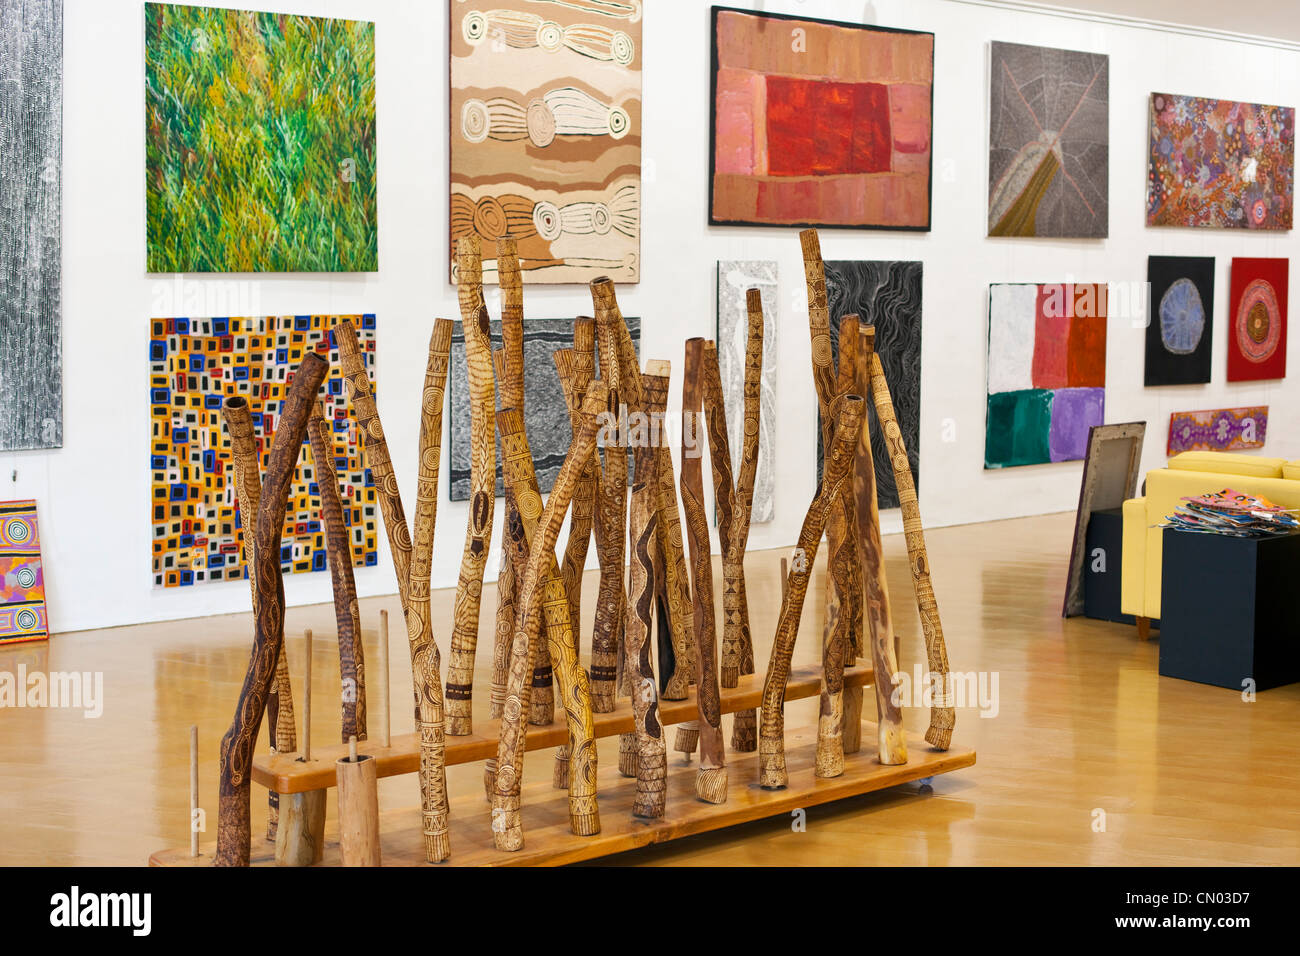 Aboriginal art gallery. Port Douglas, Queensland, Australia - Stock Image